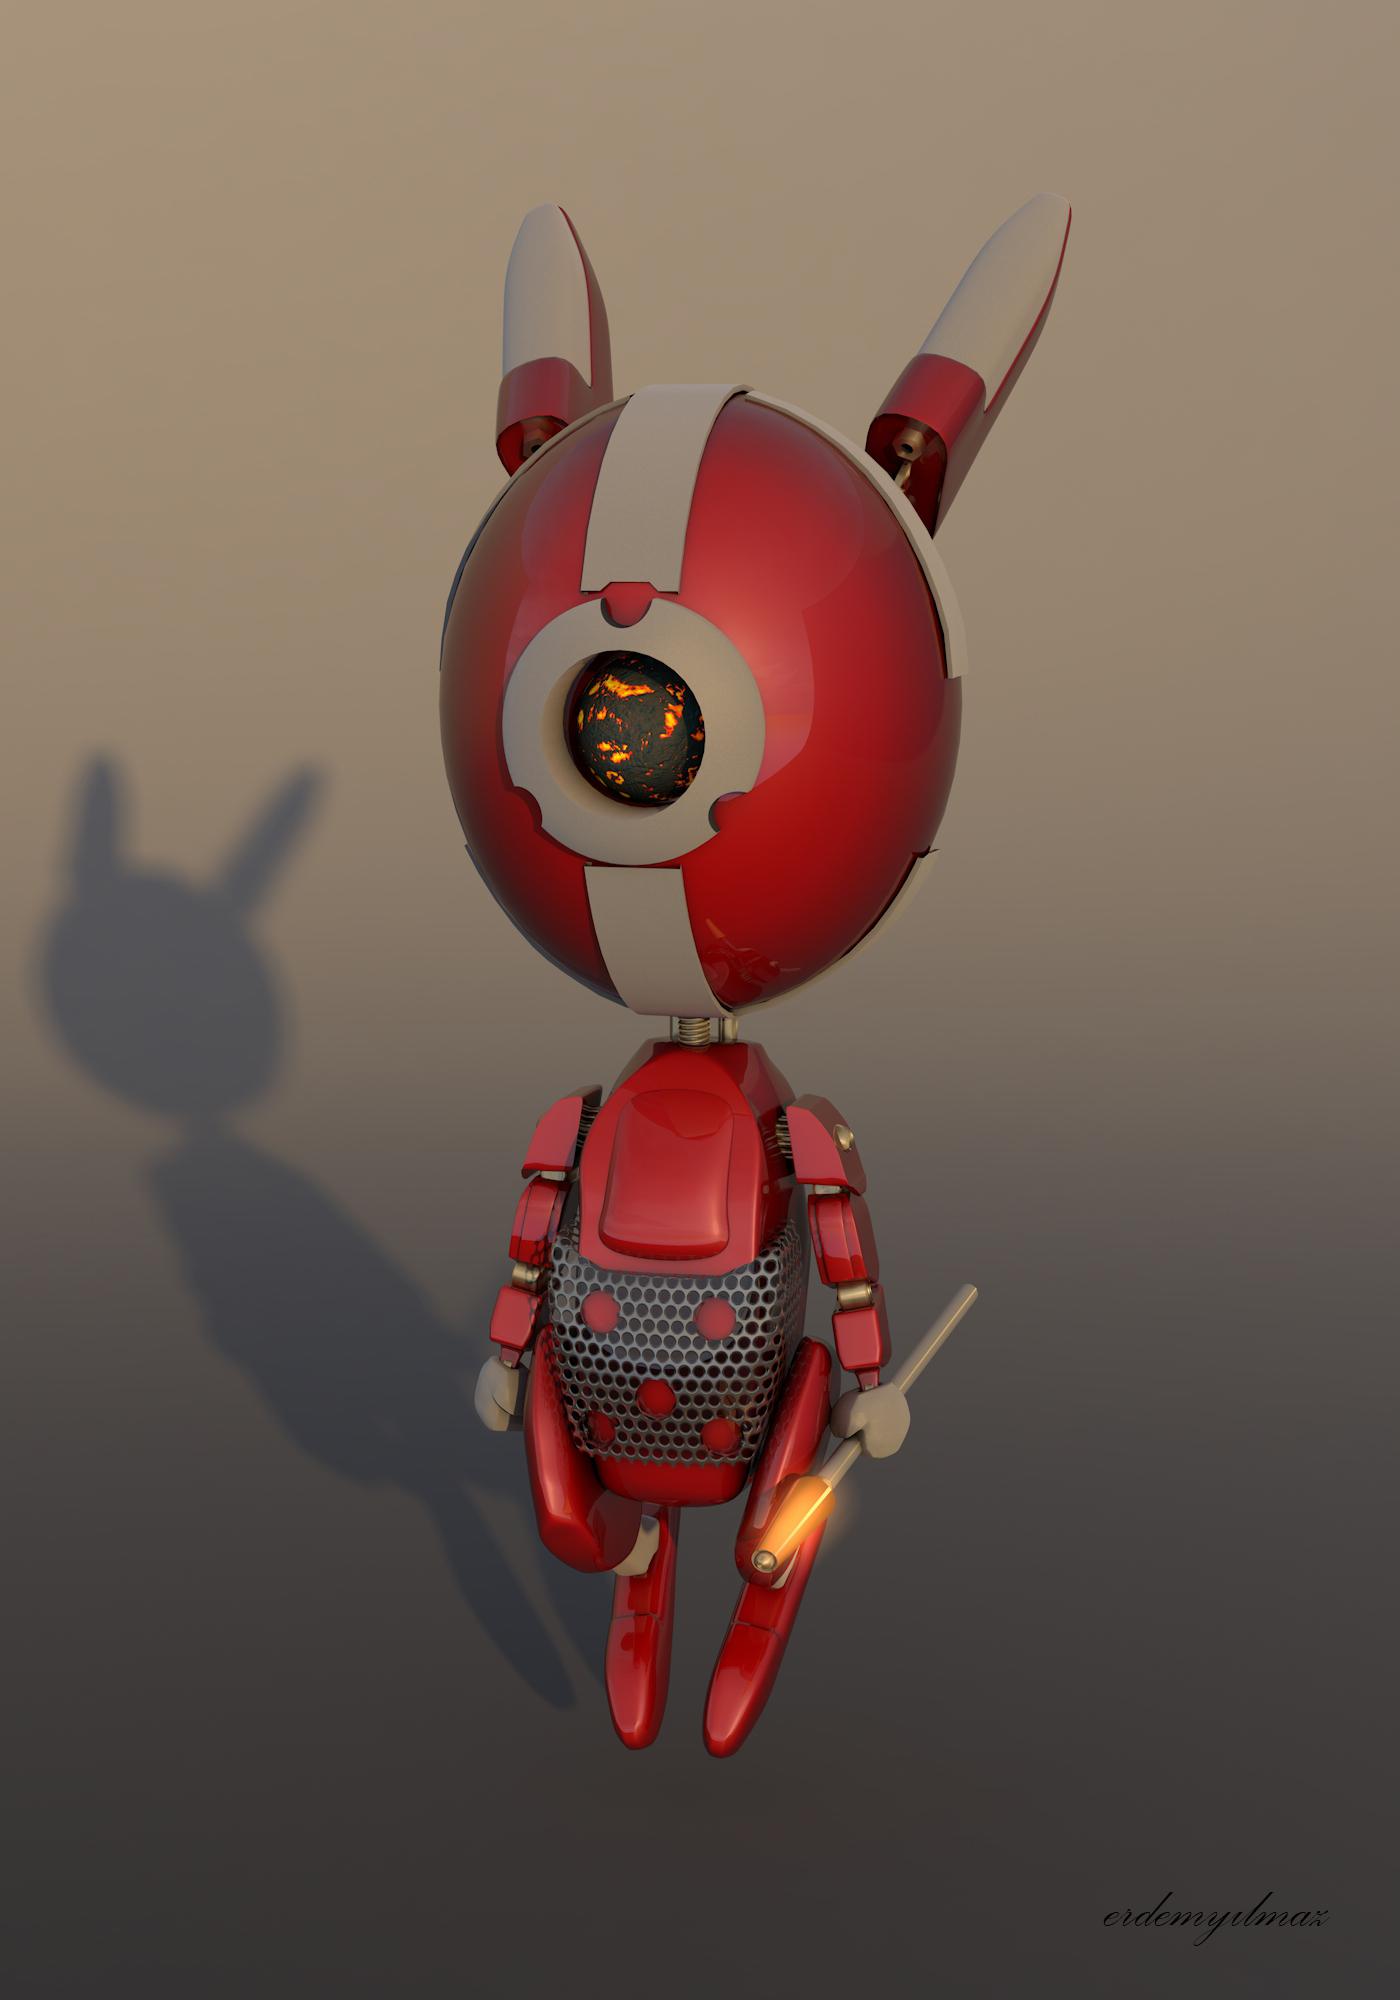 4k Hd Wallpapers For Iphone Free Stock Photo Of Robocop Robocop Ed209 Robot